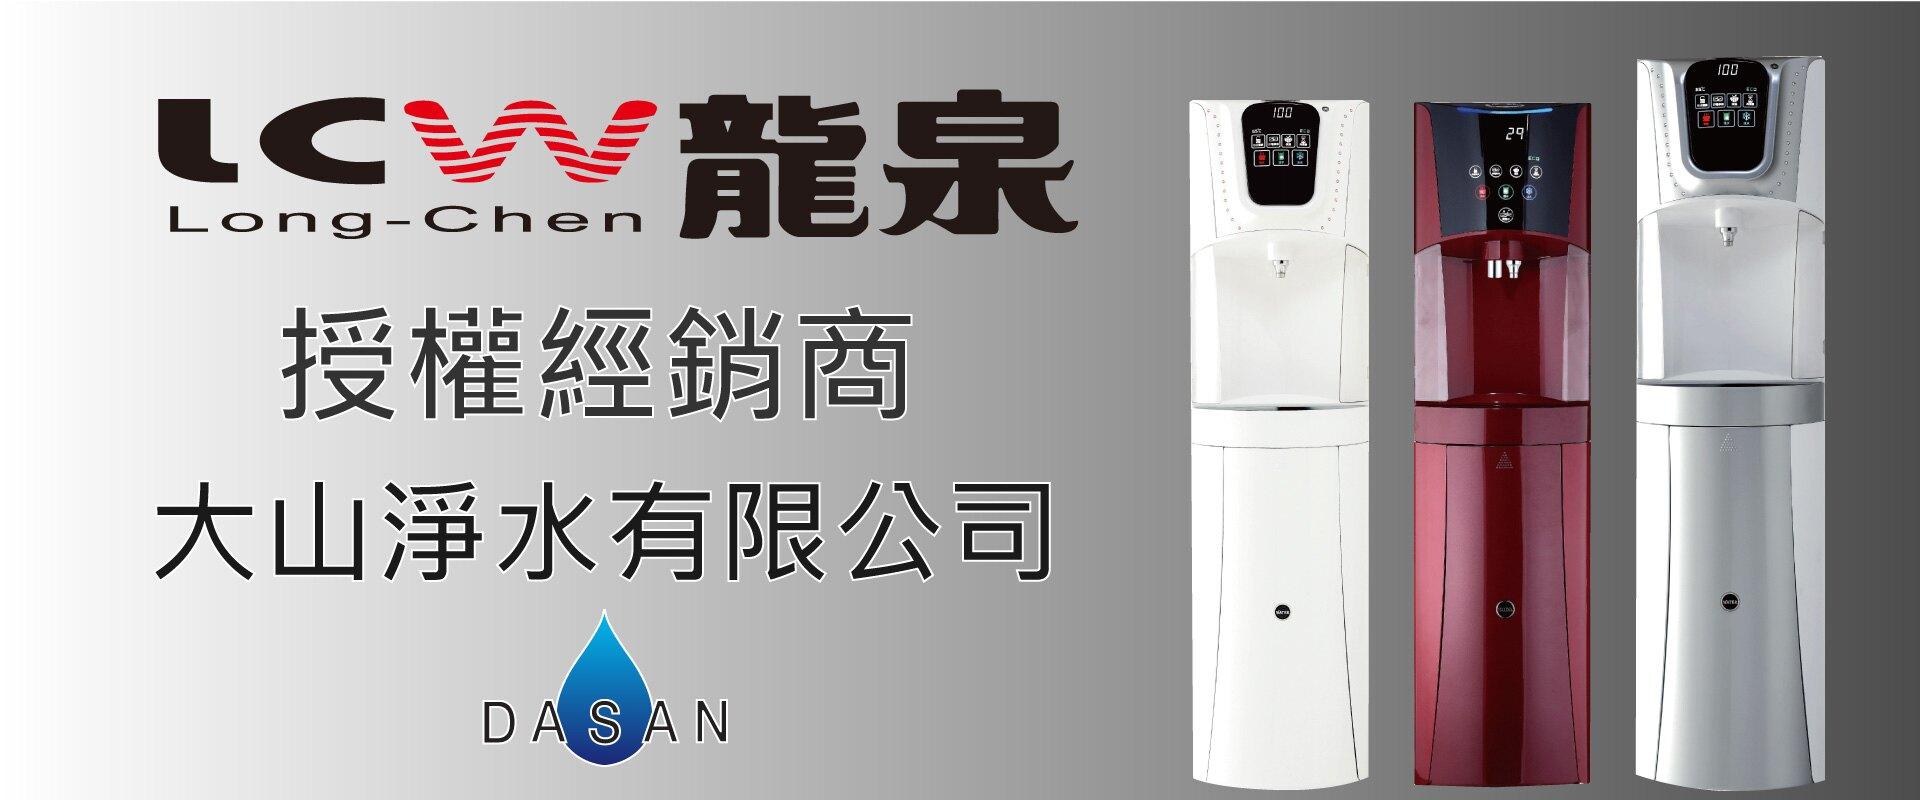 LCW龍泉 氣泡水飲水機專用 CO2鋁瓶 適用LC-7871-1AB/LC-7871-2AB/LC-7872-1AB/LC-7872-2AB